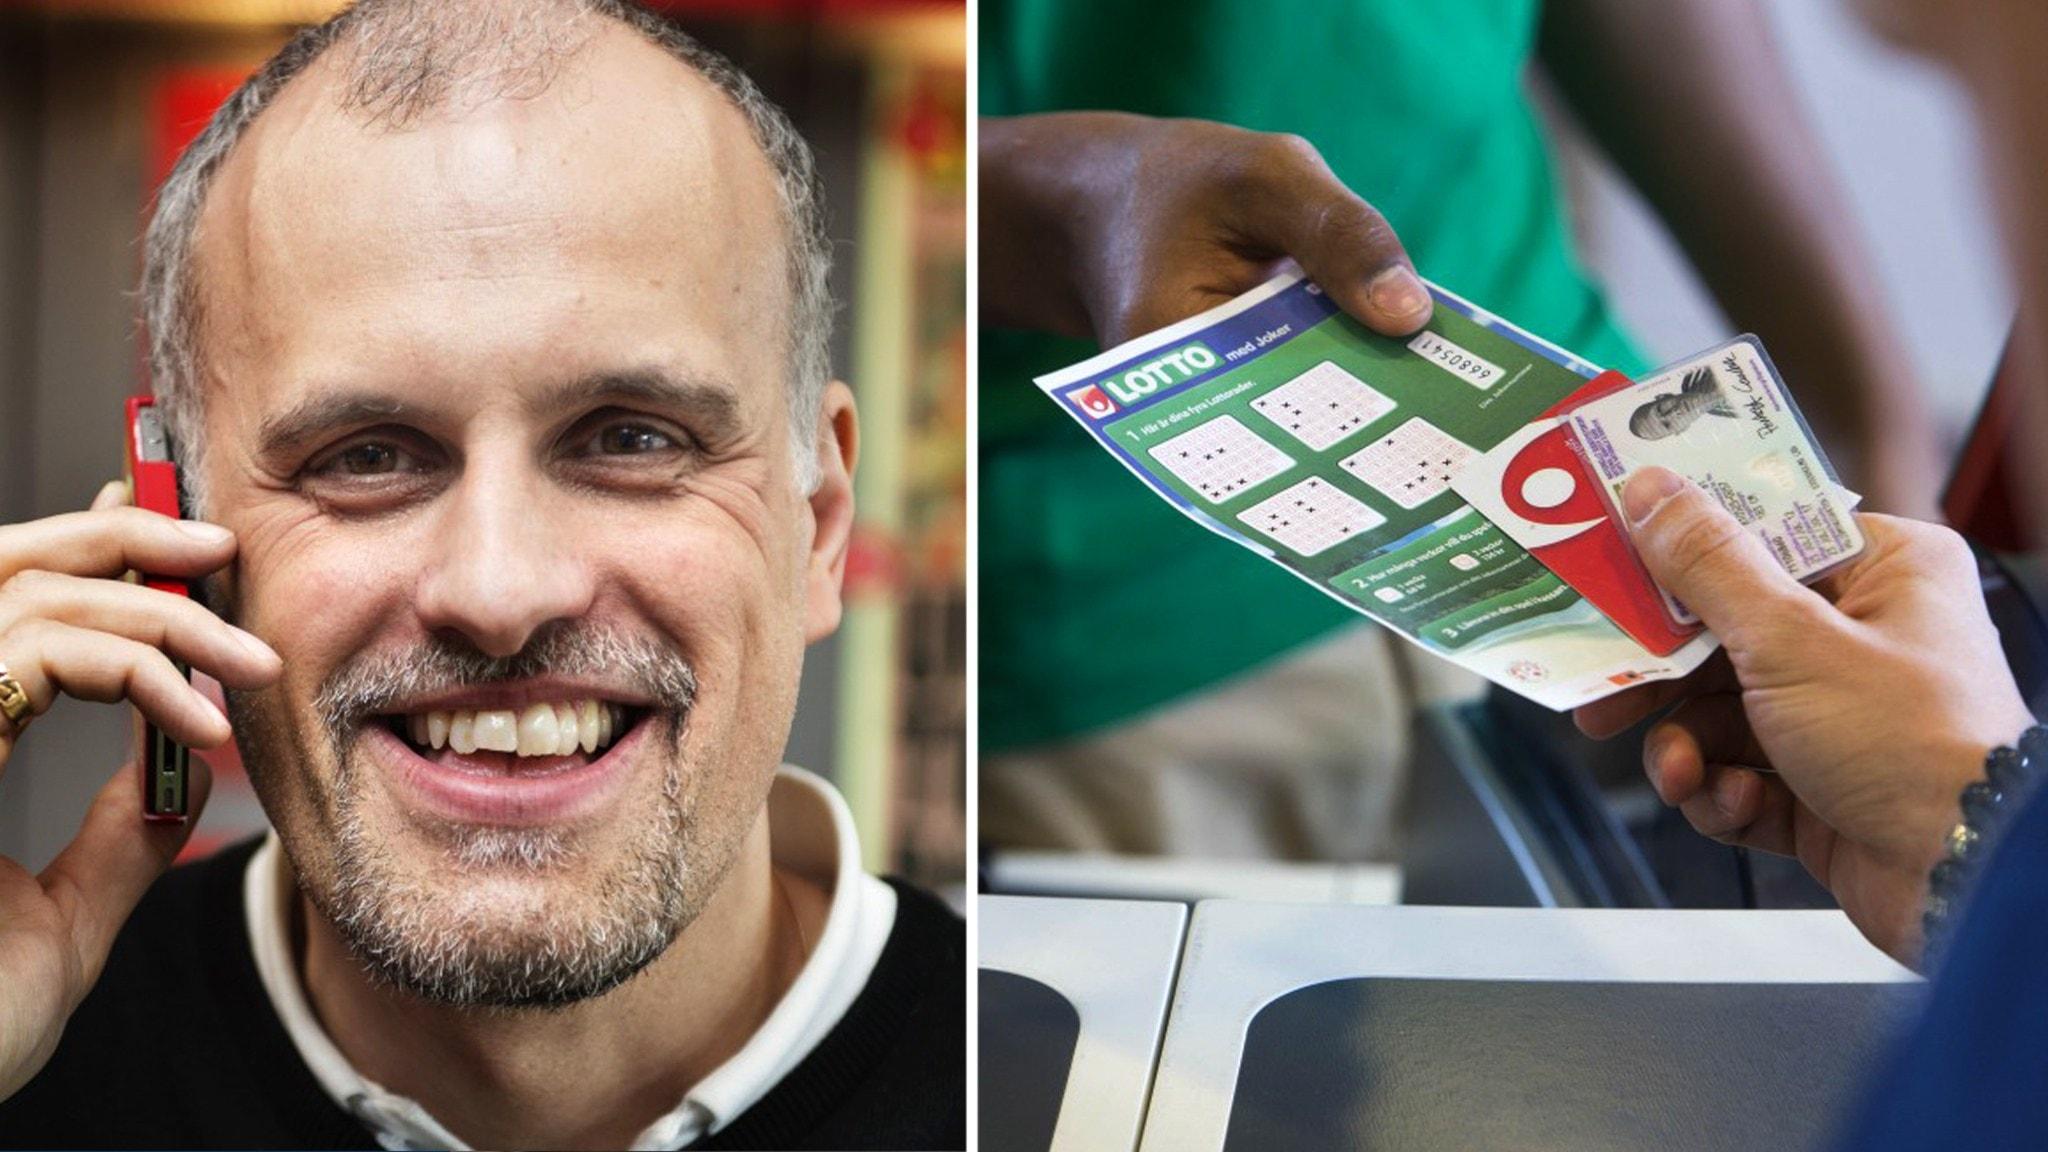 Inlämning Lotto